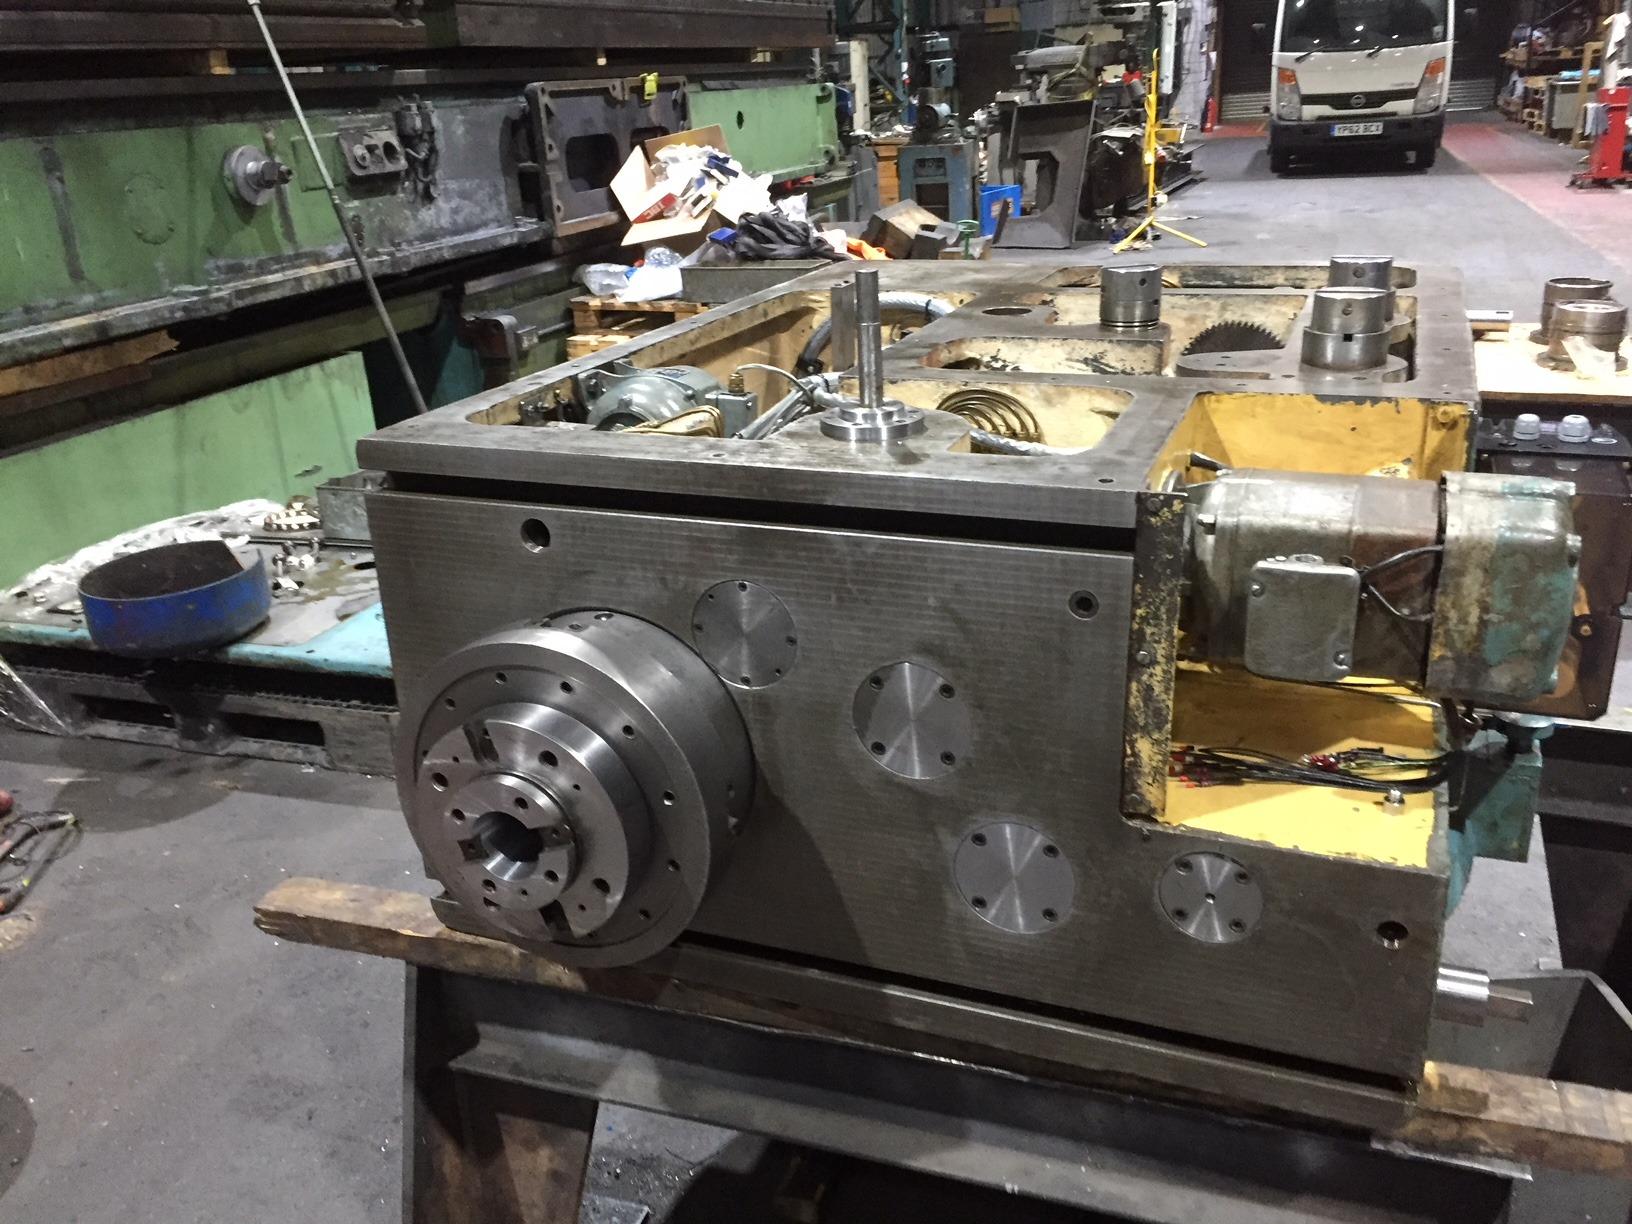 repairing a milling machine